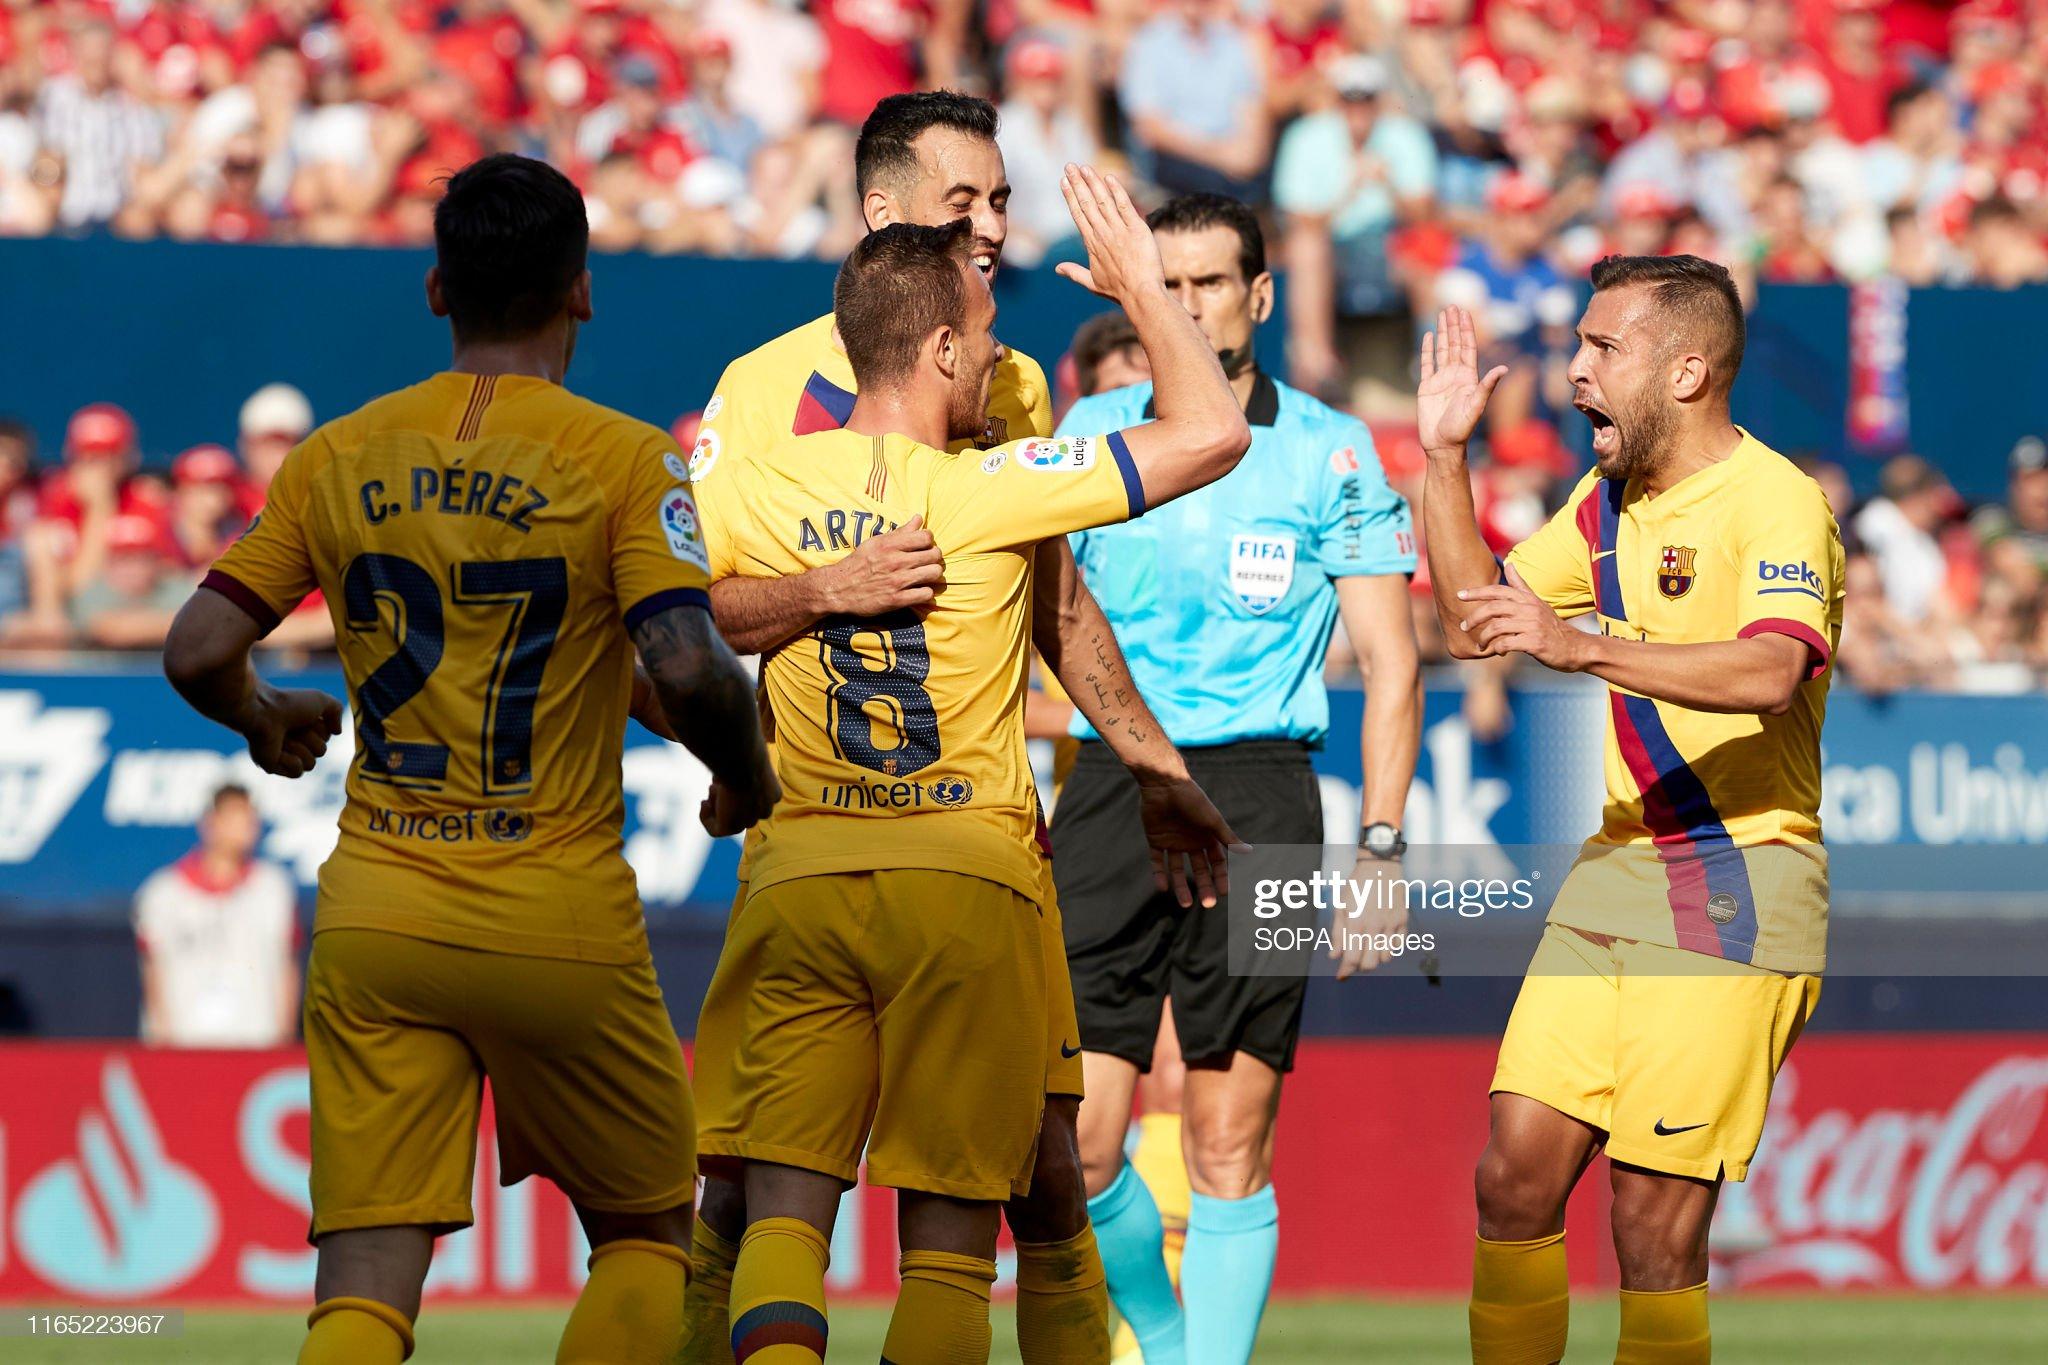 صور مباراة : أوساسونا - برشلونة 2-2 ( 31-08-2019 )  Barcelona-celebrates-a-goal-during-the-spanish-la-liga-santander-ca-picture-id1165223967?s=2048x2048